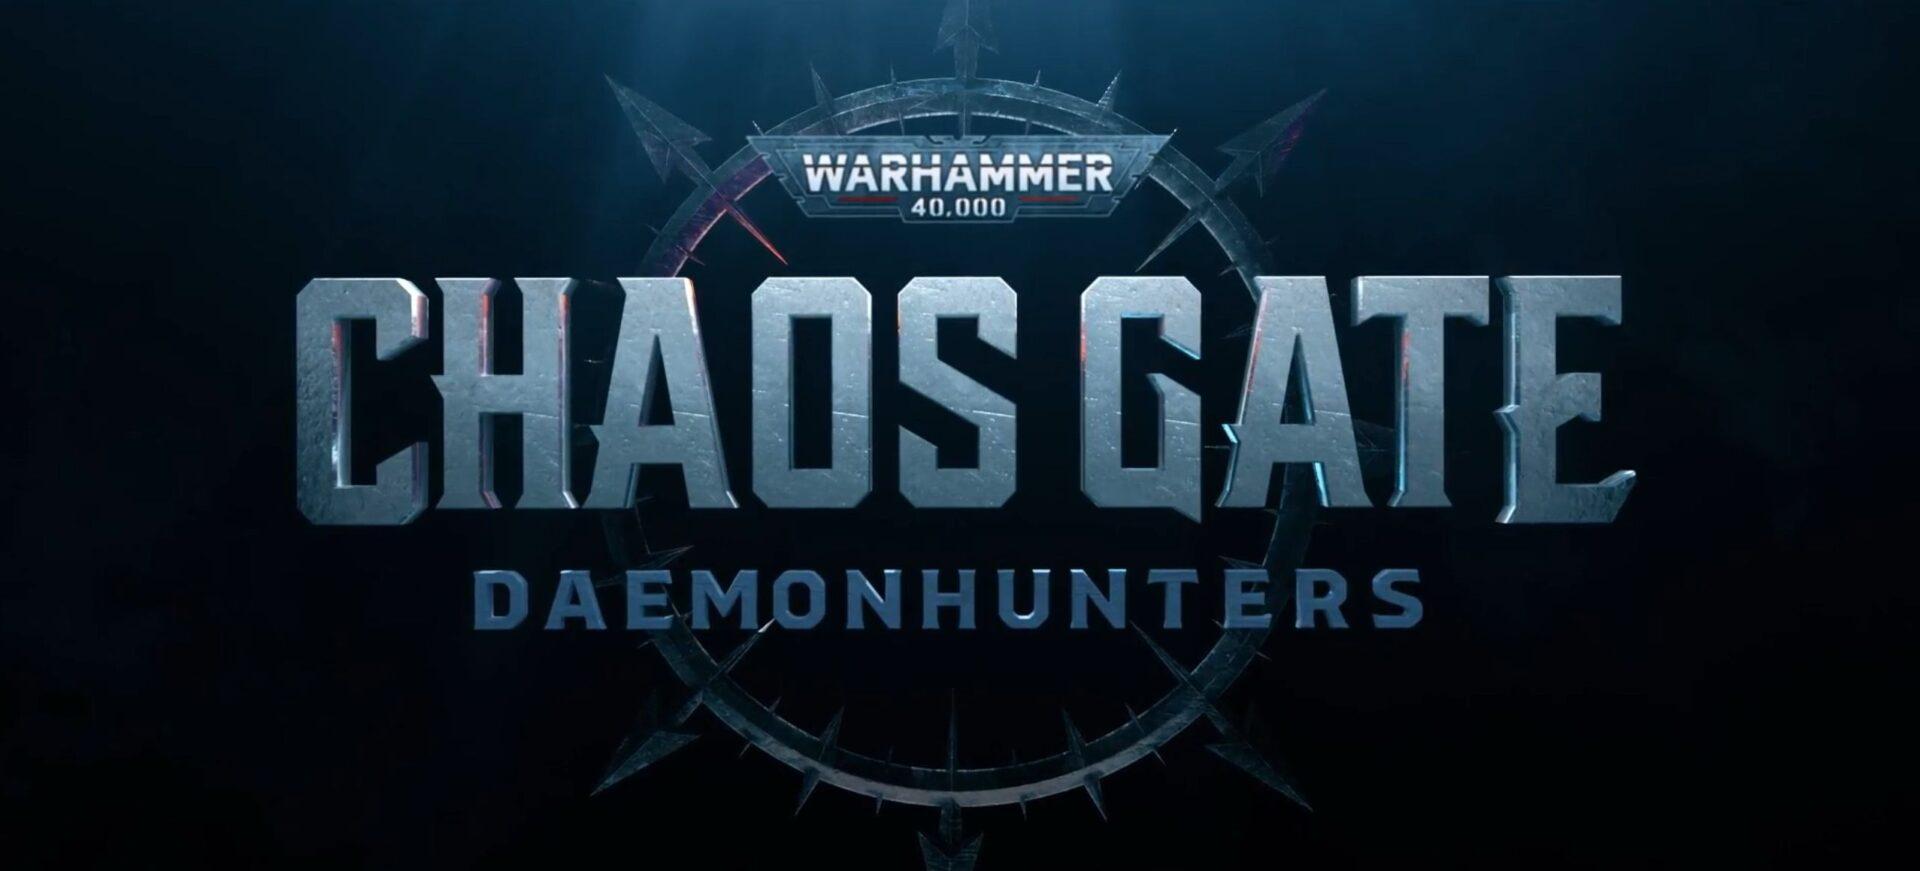 Warhammer 40,000 Chaos Gate Demonhunters